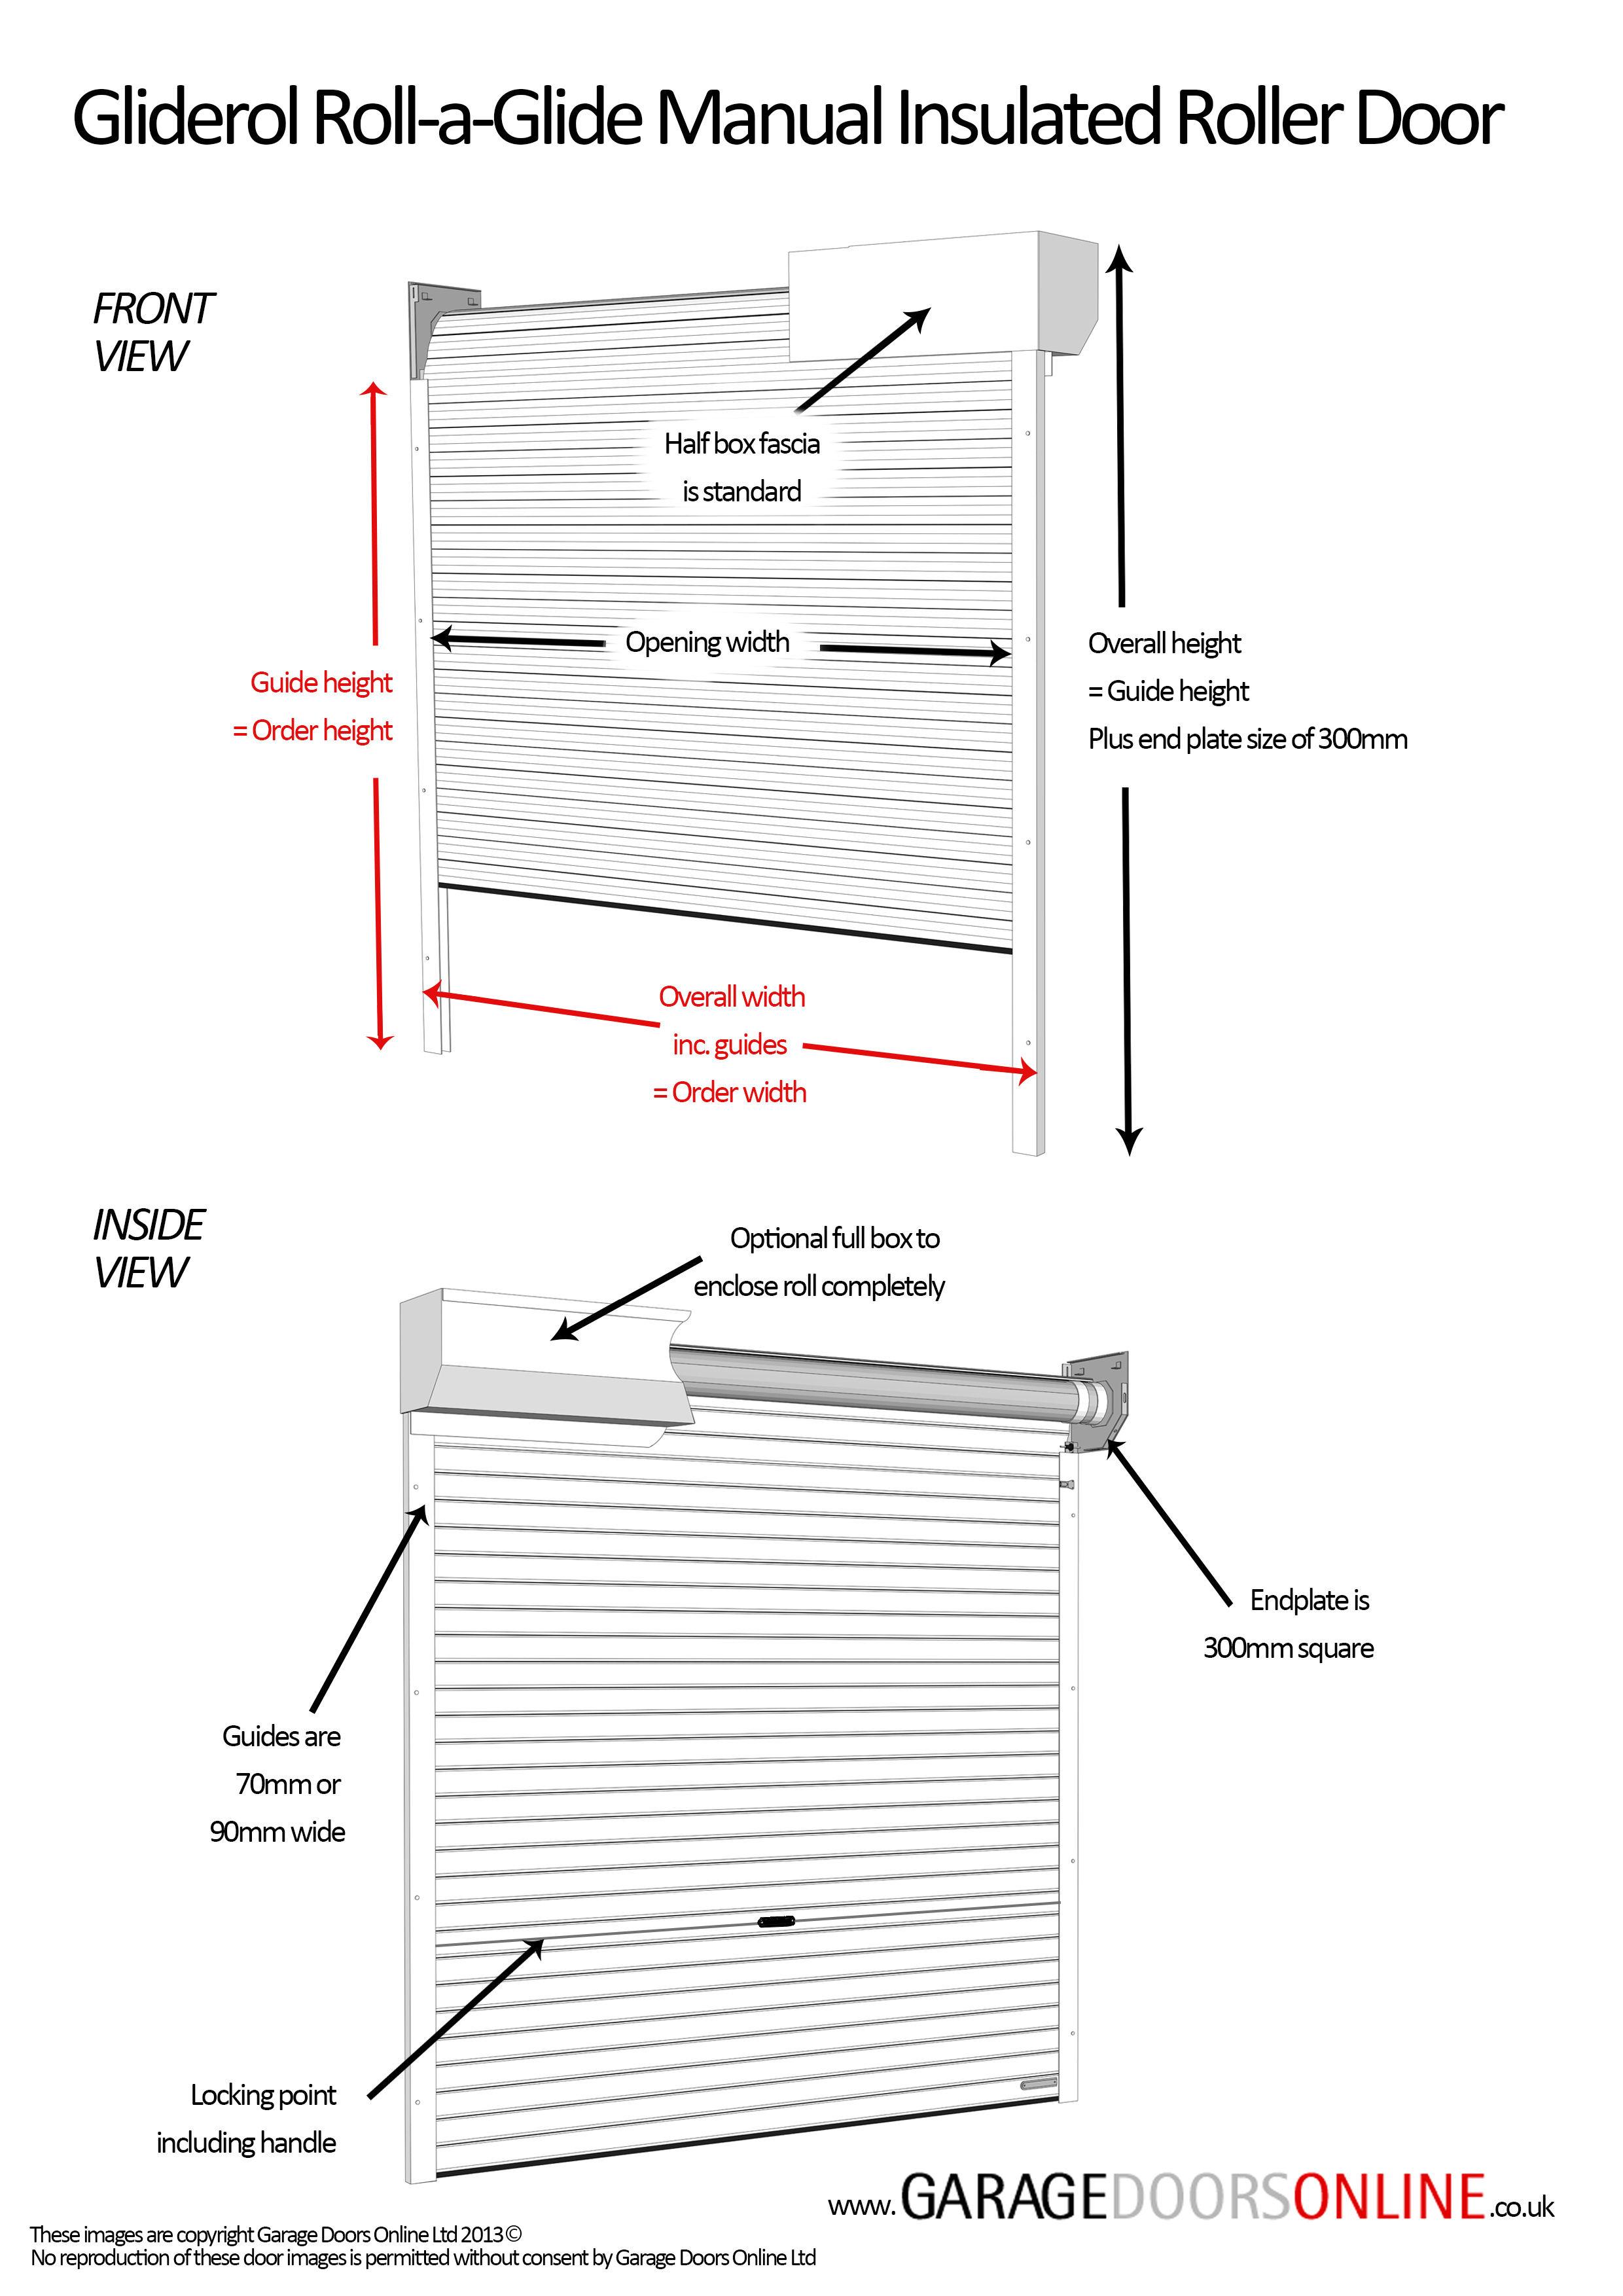 Gliderol Manual Roller Garage Doors